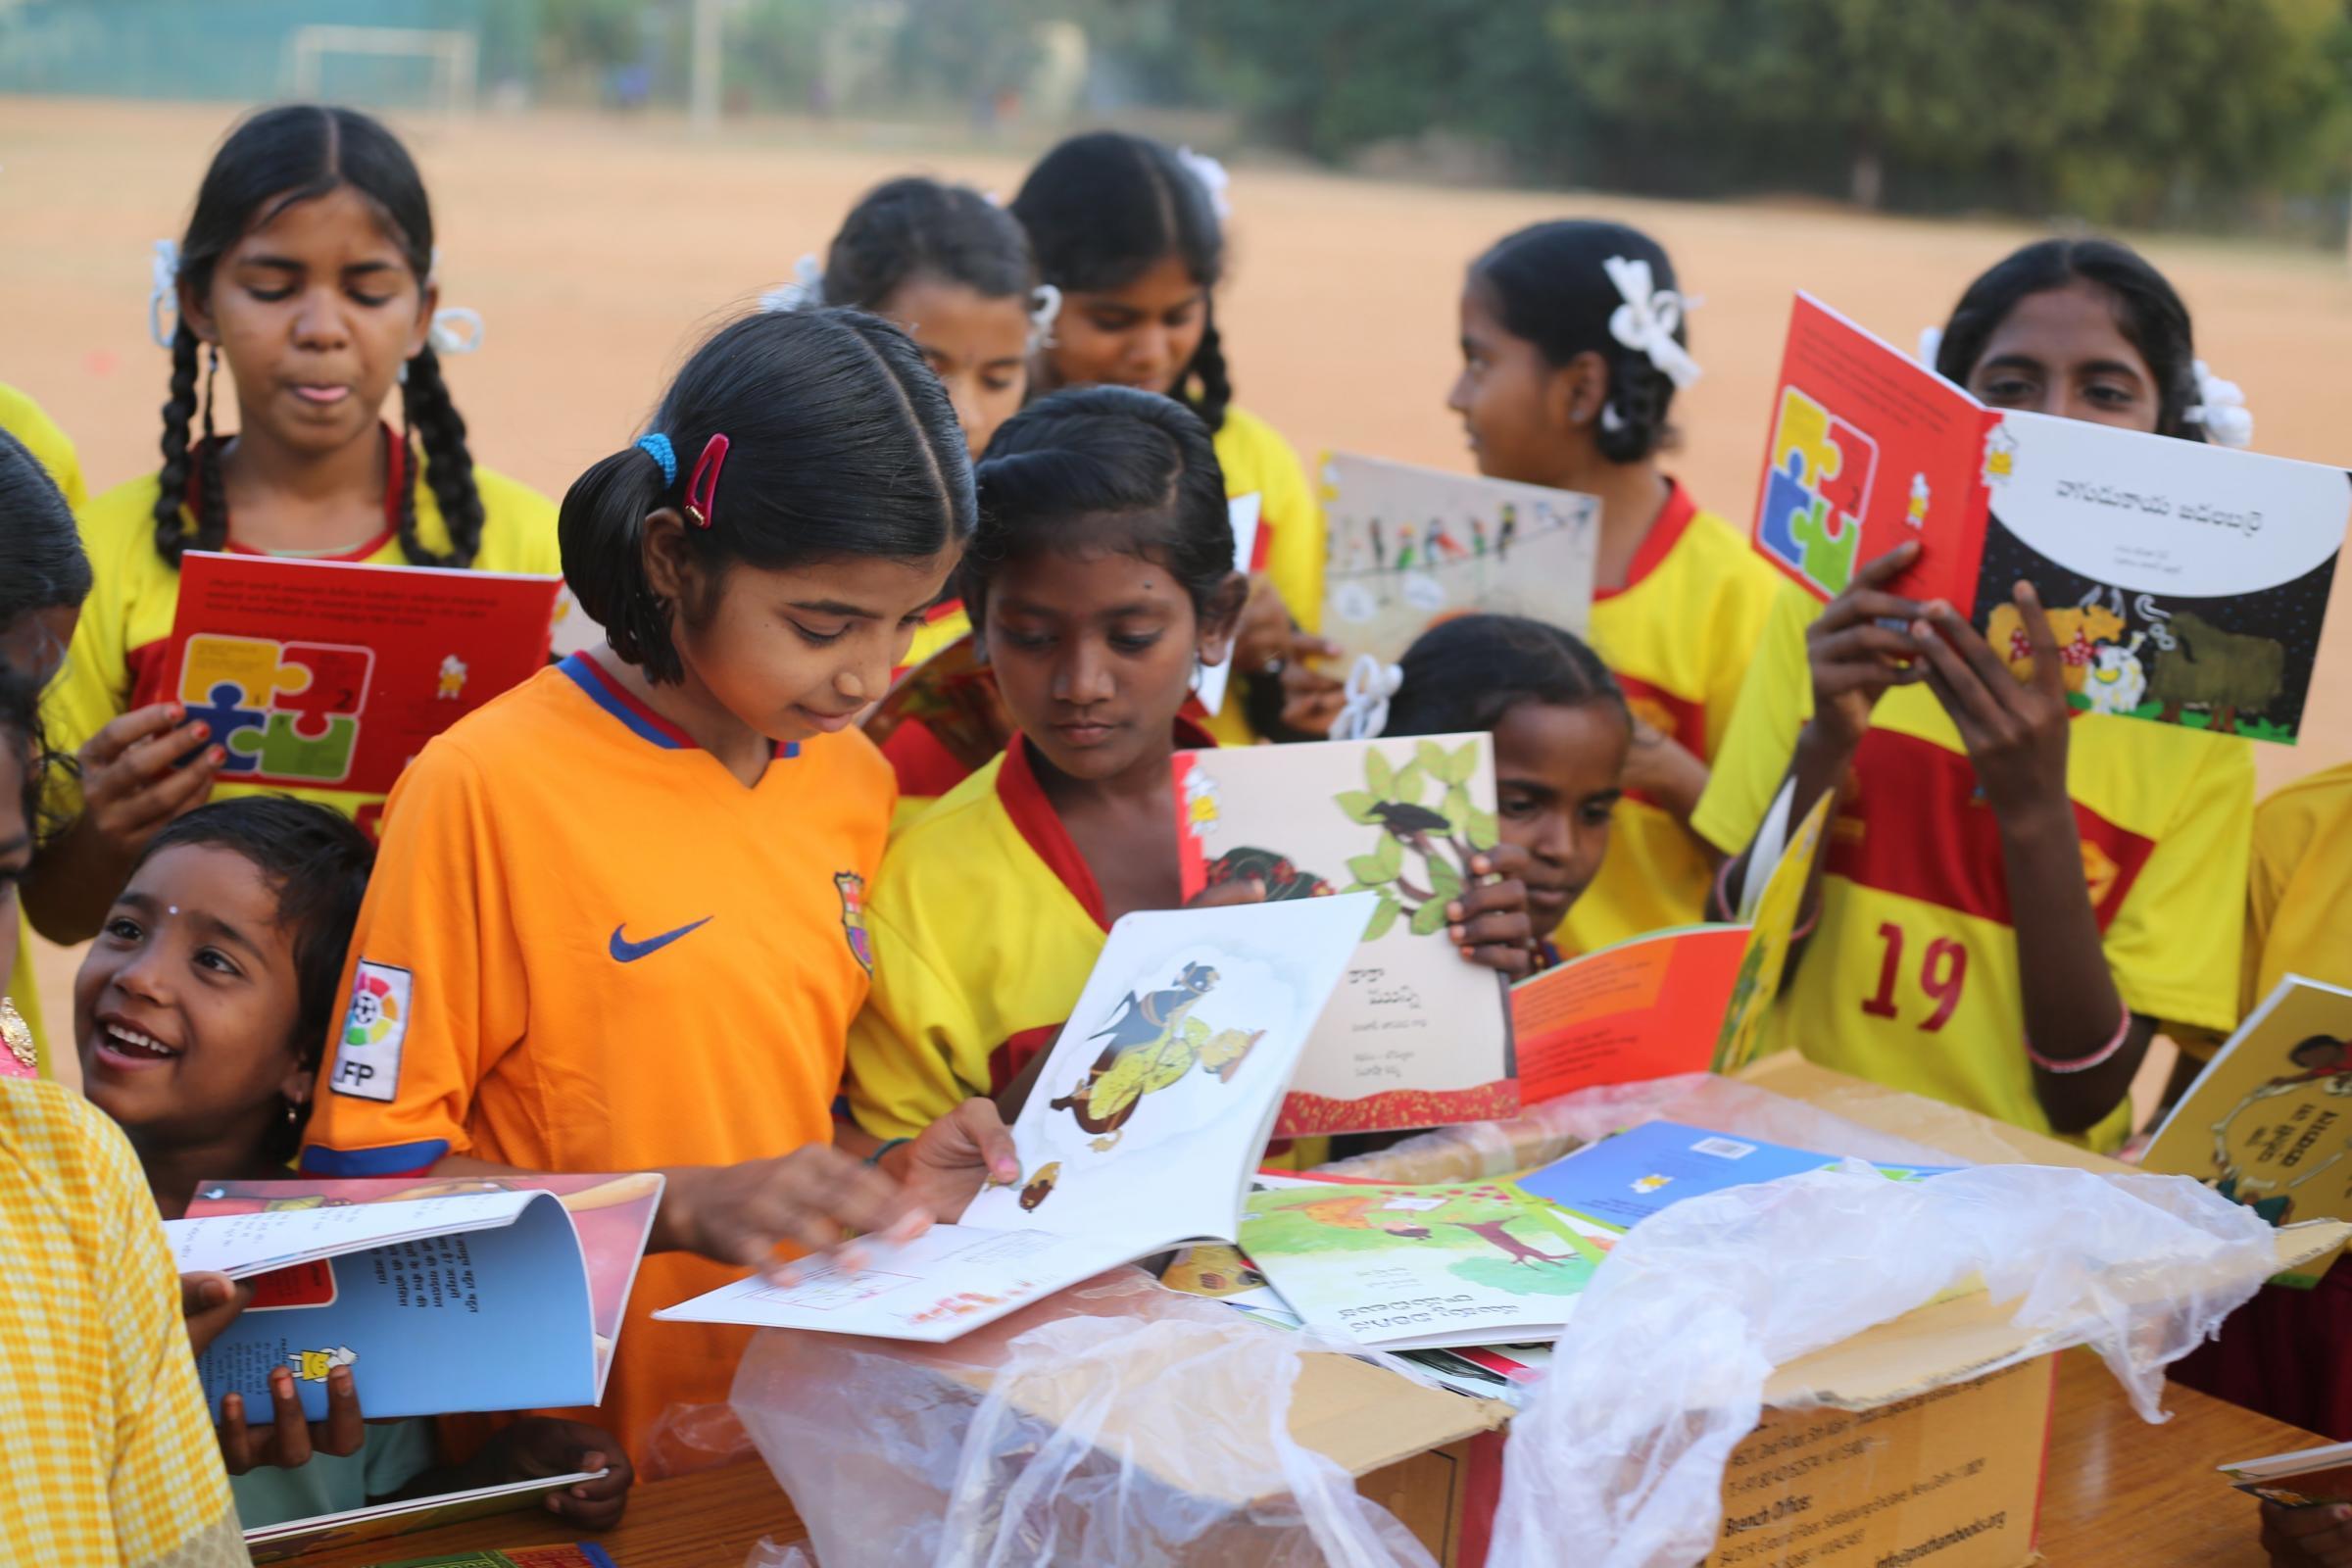 Fundraising helps children in rural India